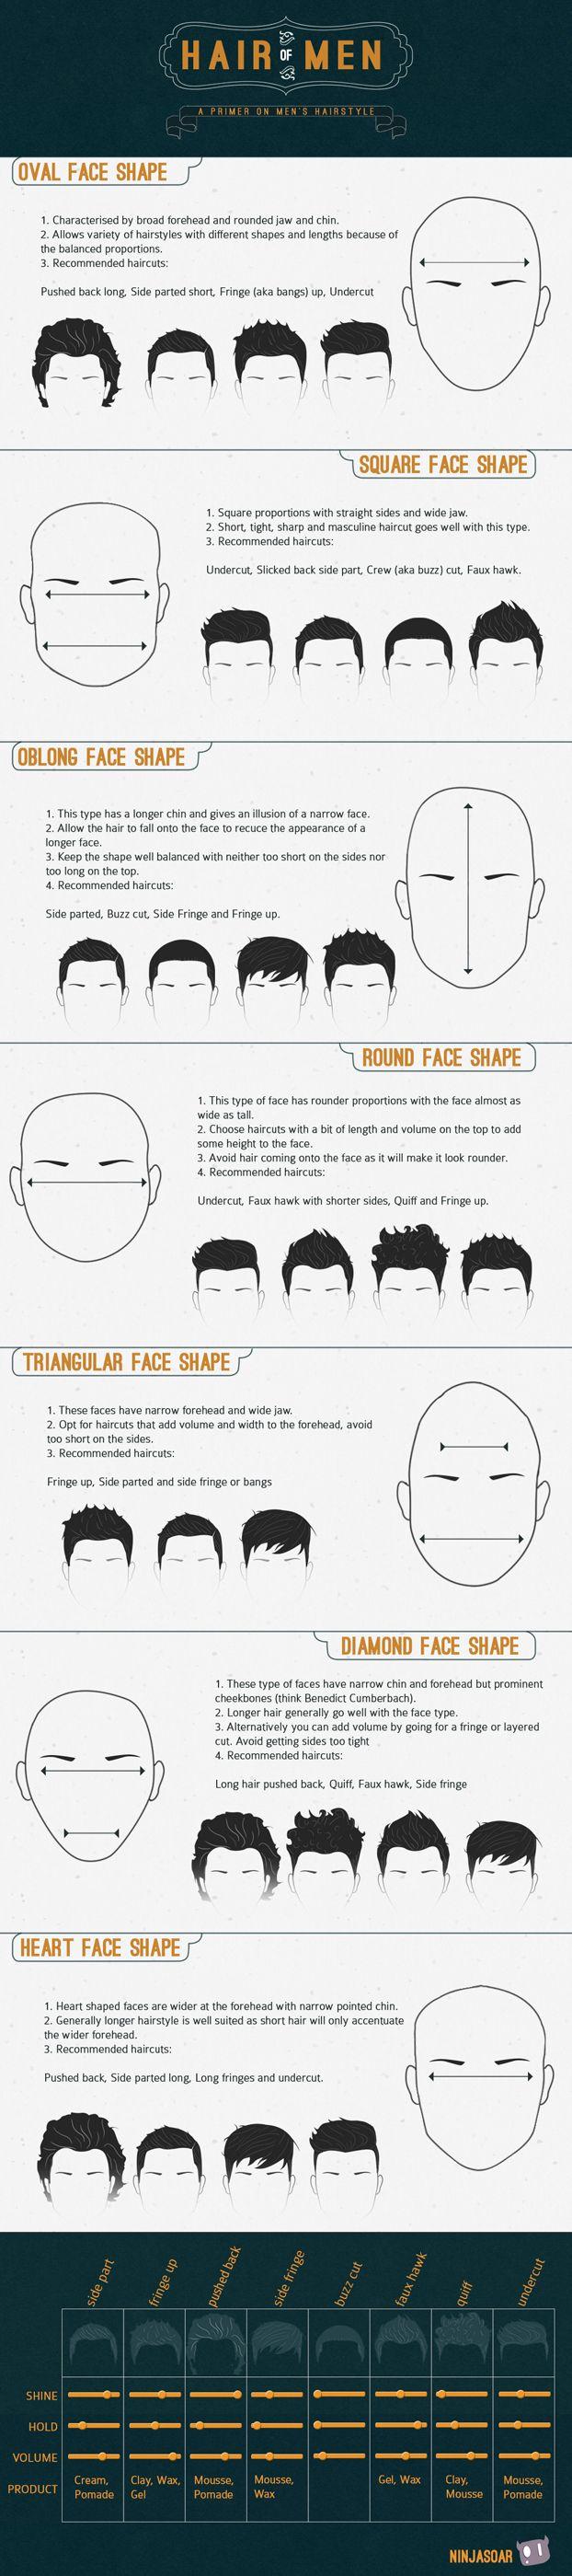 Hair of Men